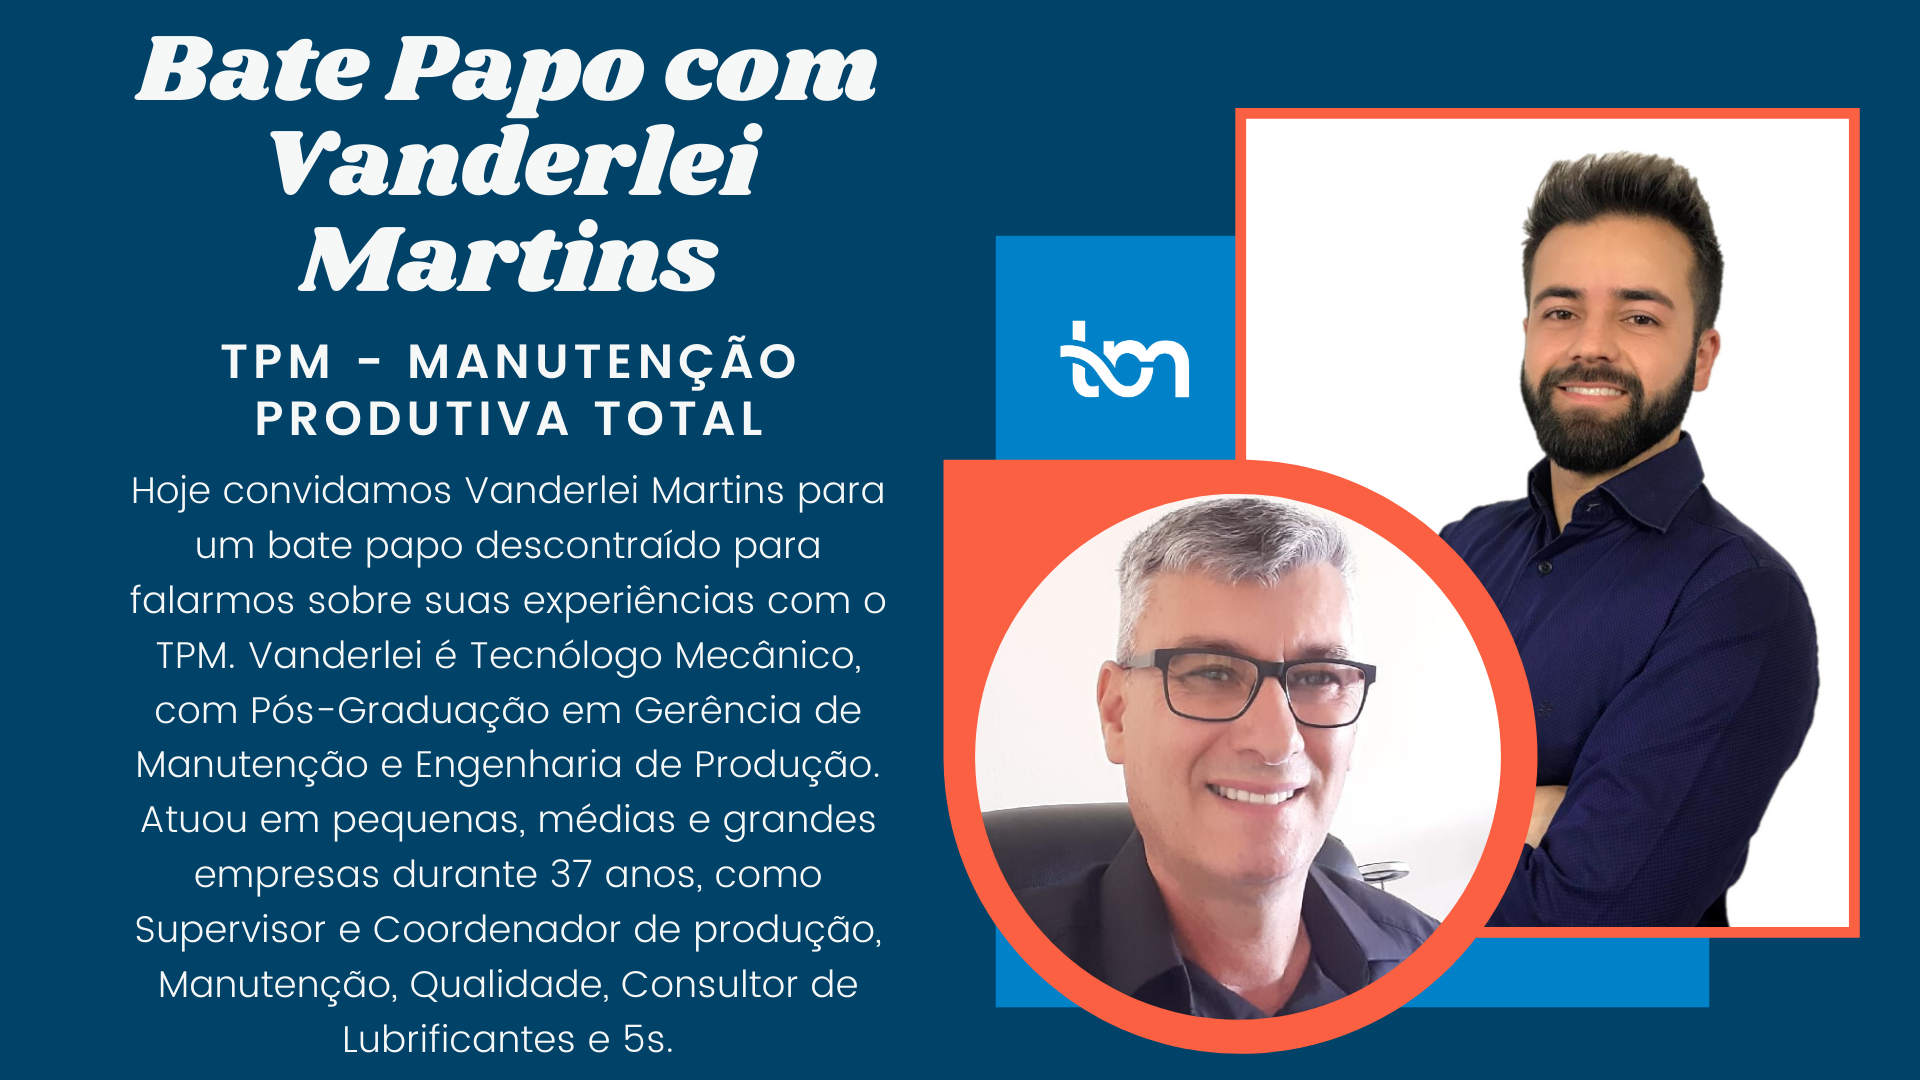 Bate Papo com Vanderlei Martins